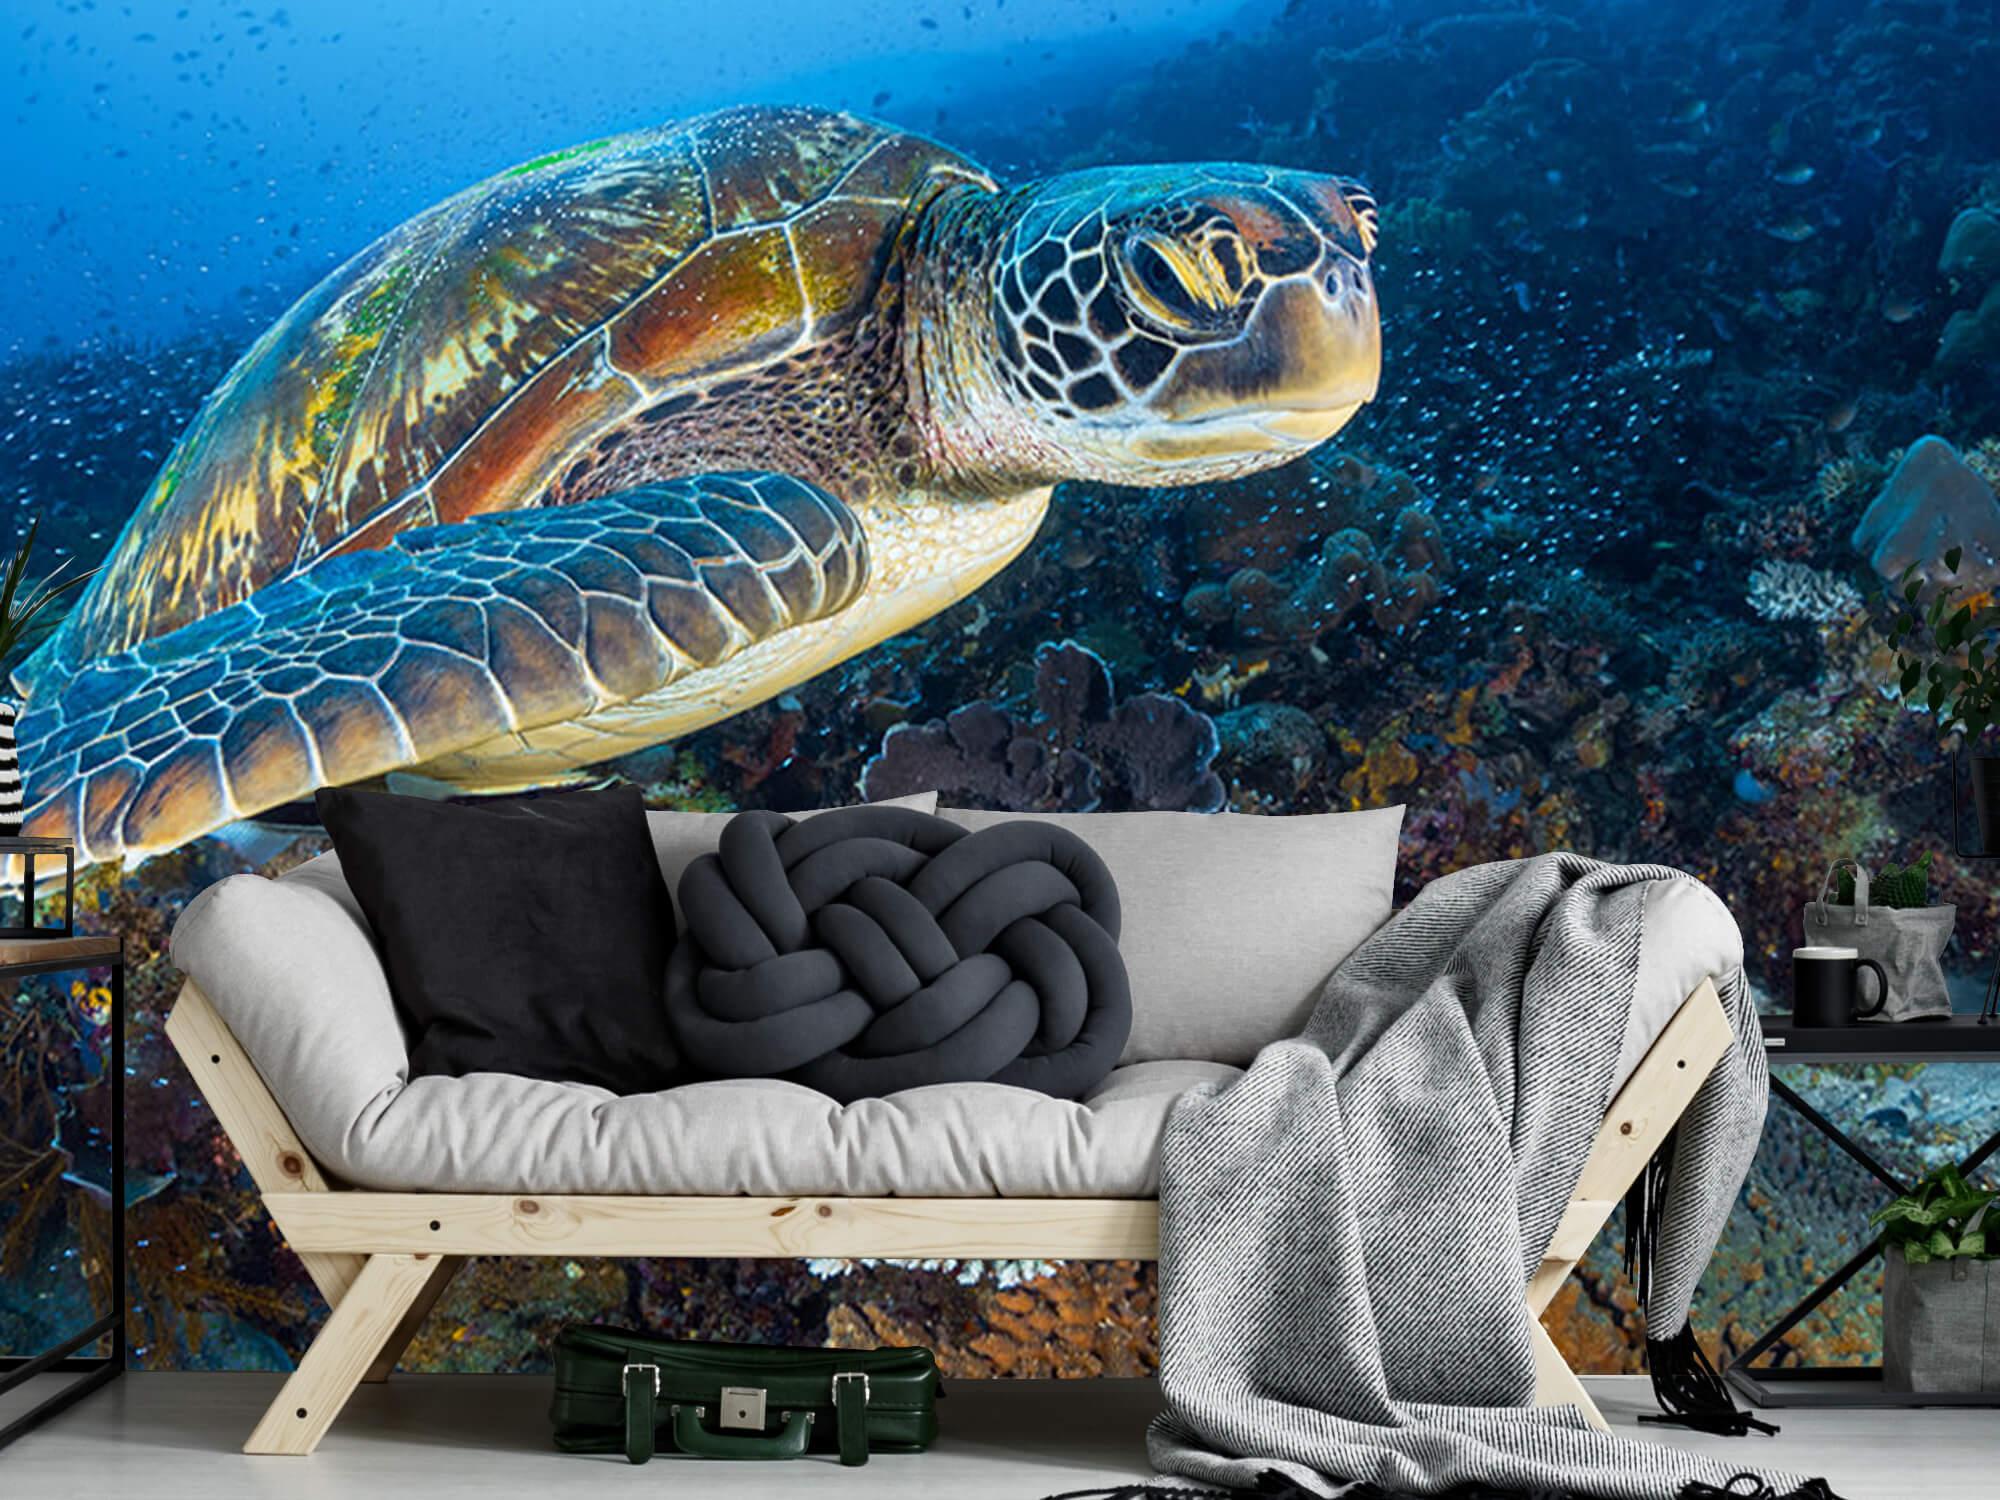 Green sea turtle from Raja Ampat 12